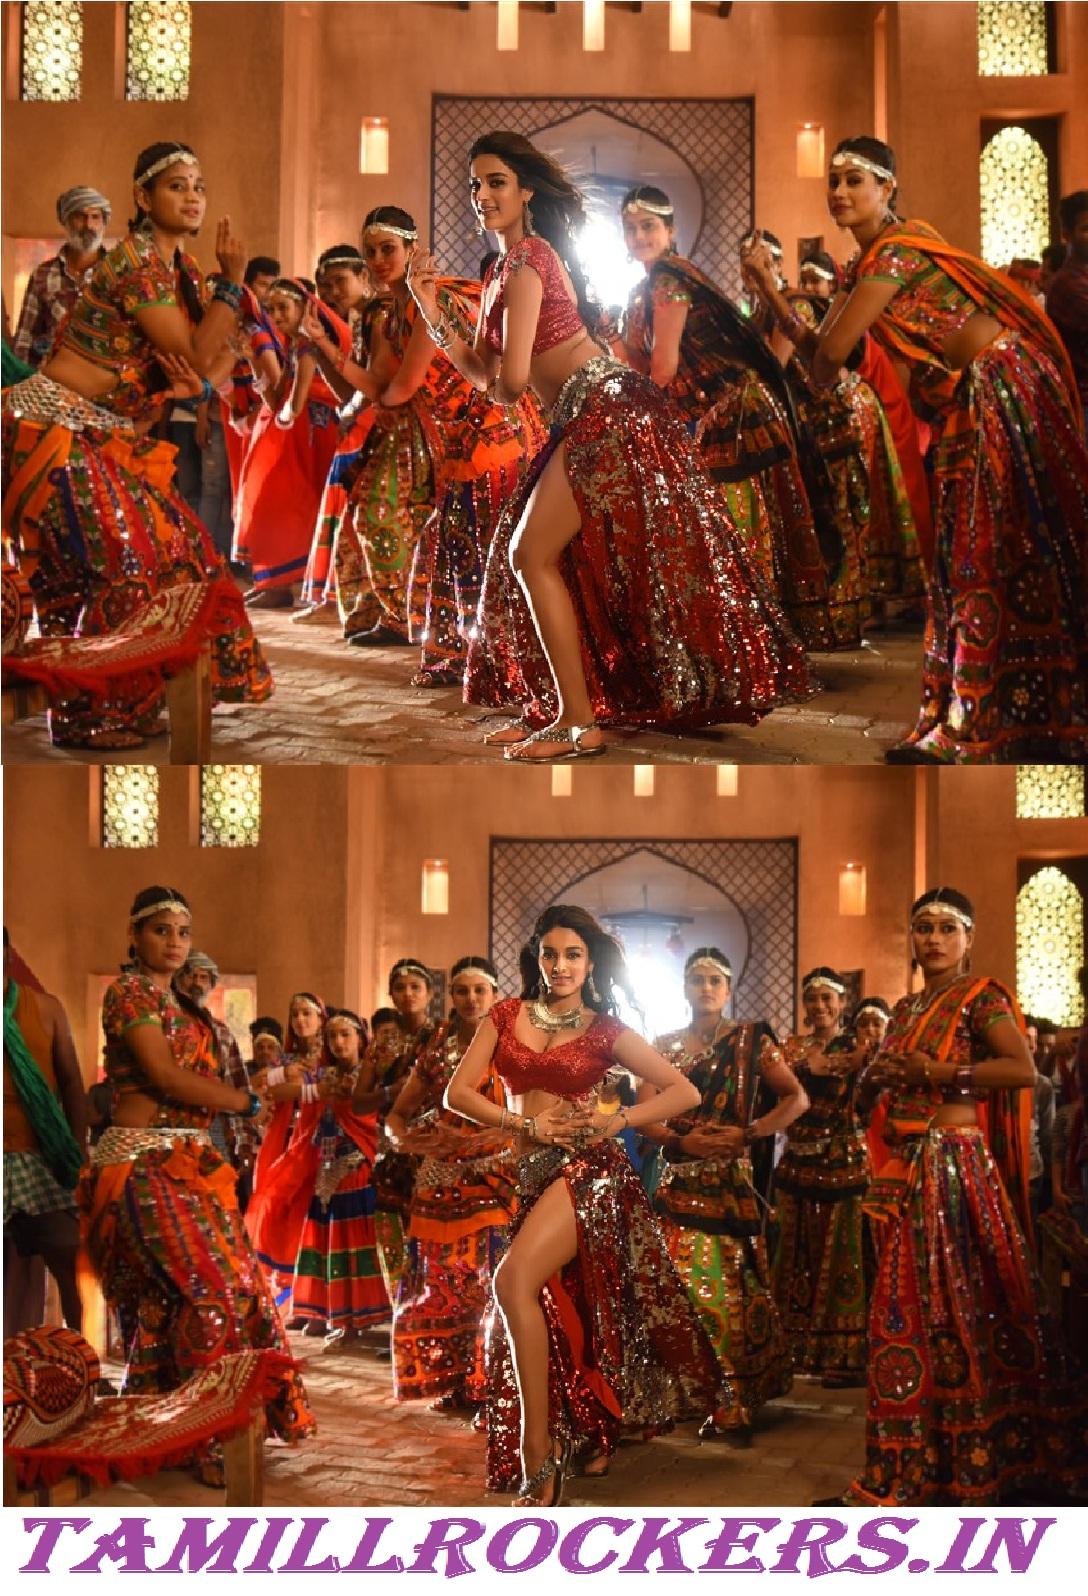 iSmart Shankar full Movie TamilRockers 2019: Review Latest